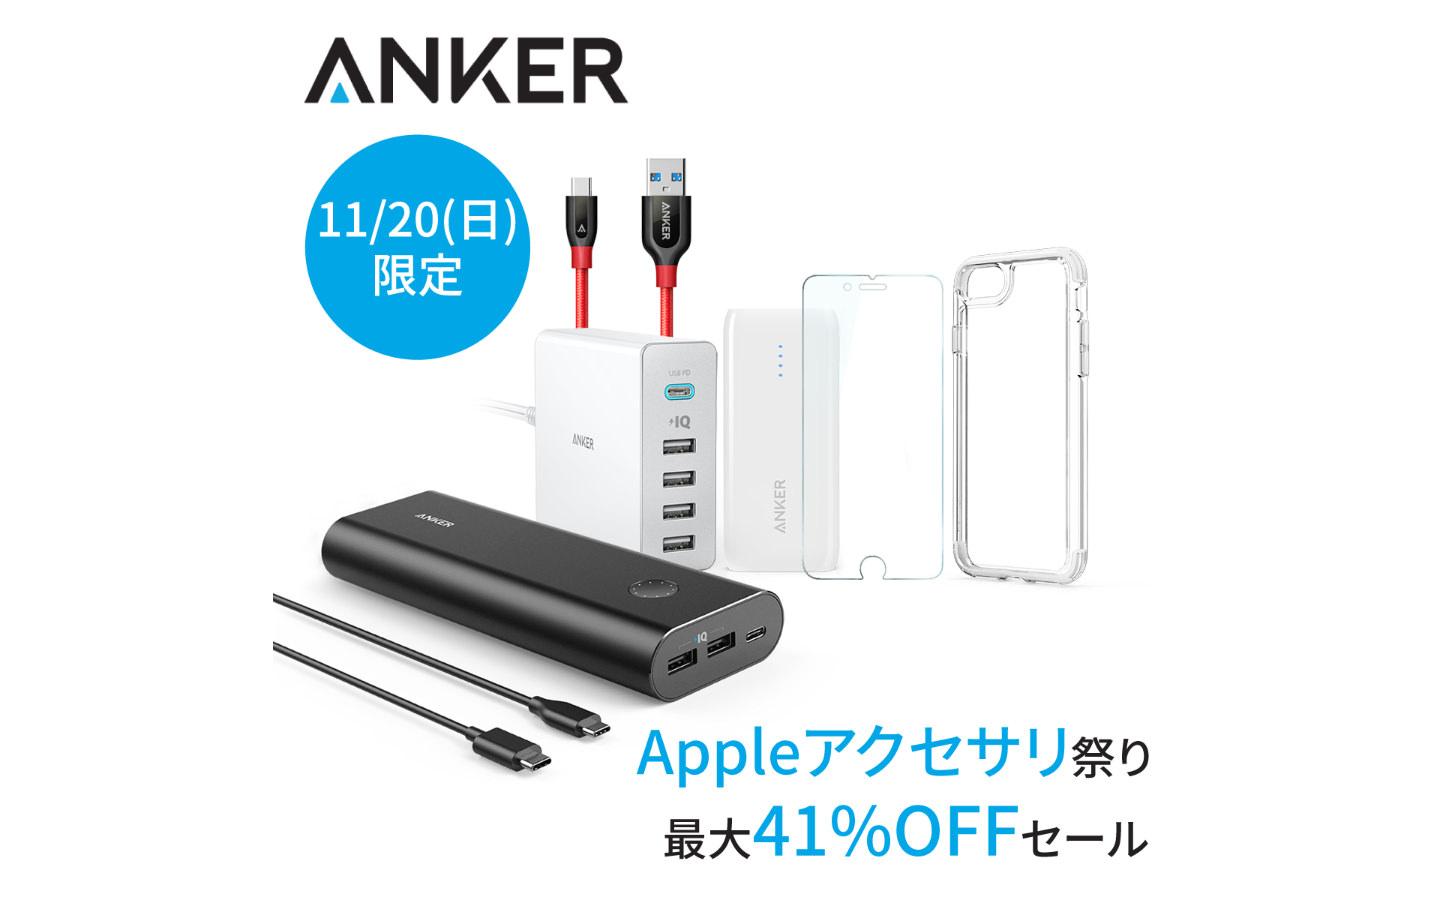 anker-20161120-sale.jpg